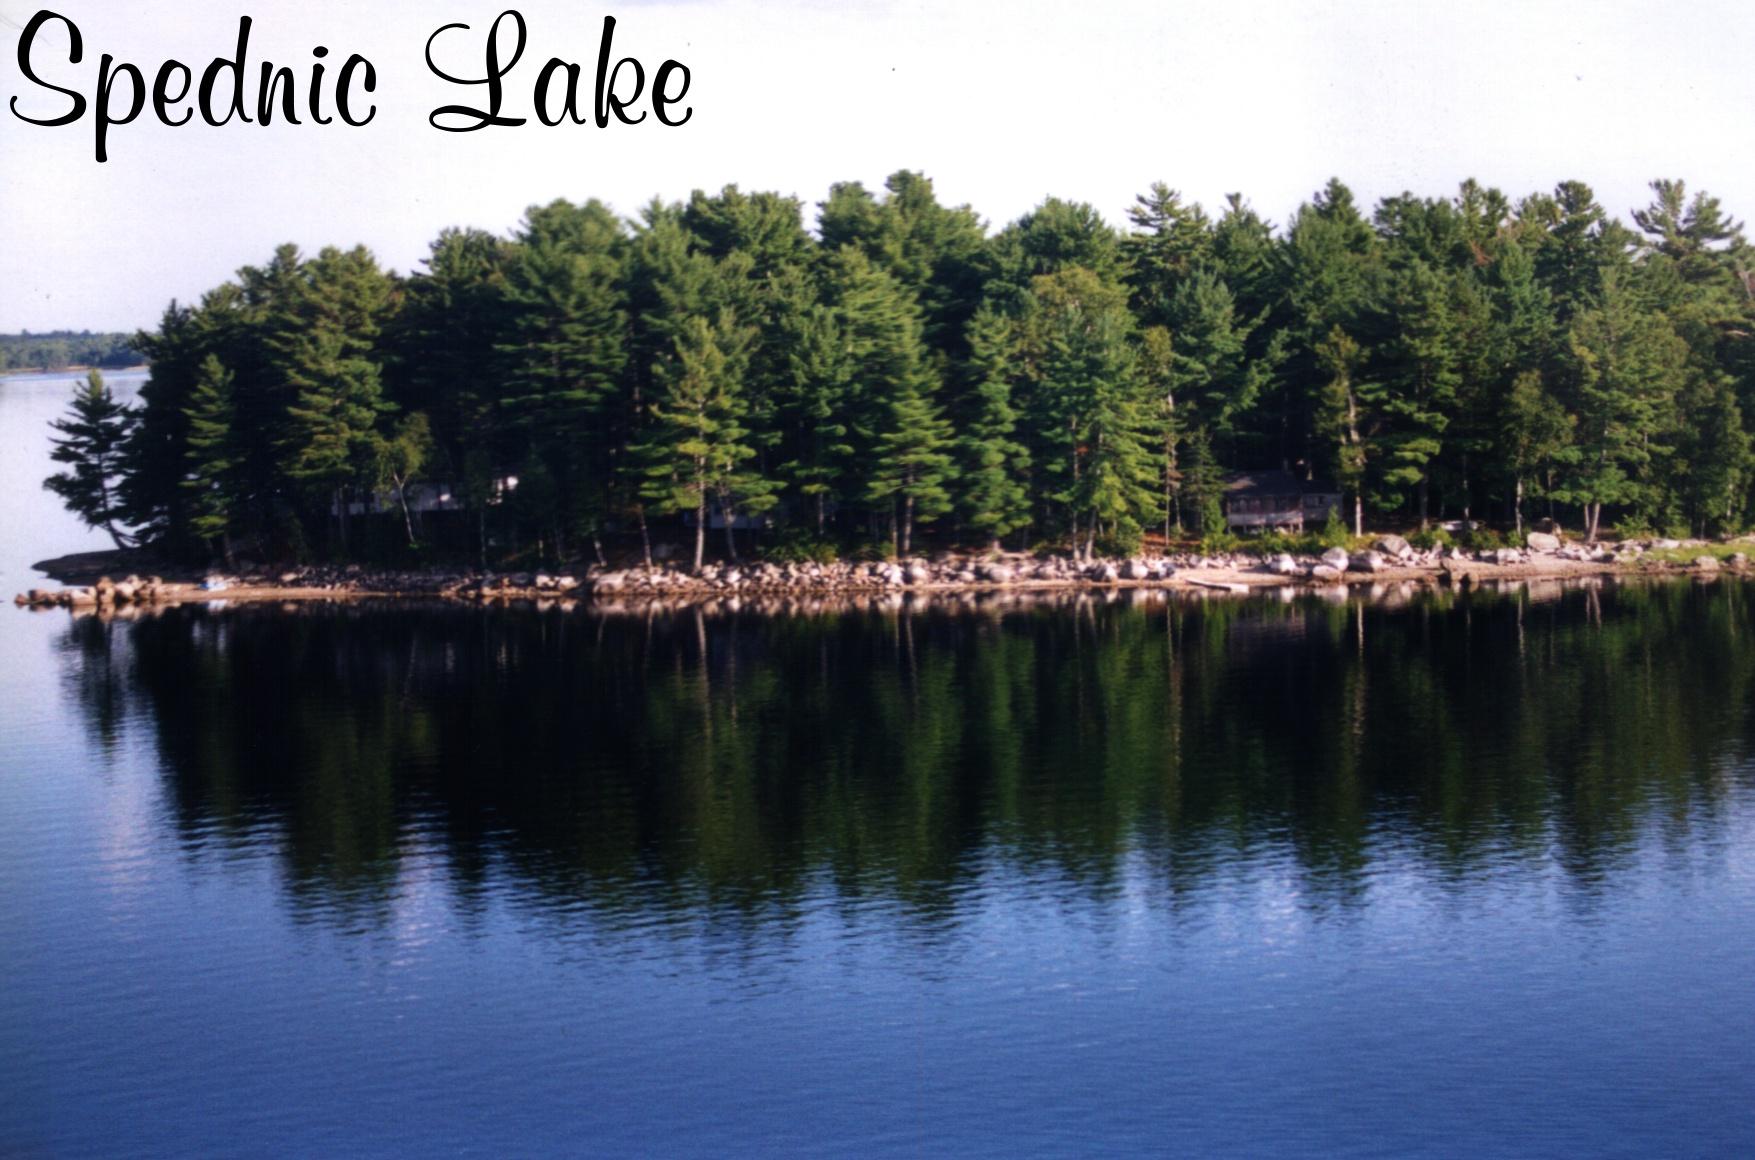 Spednic Lake